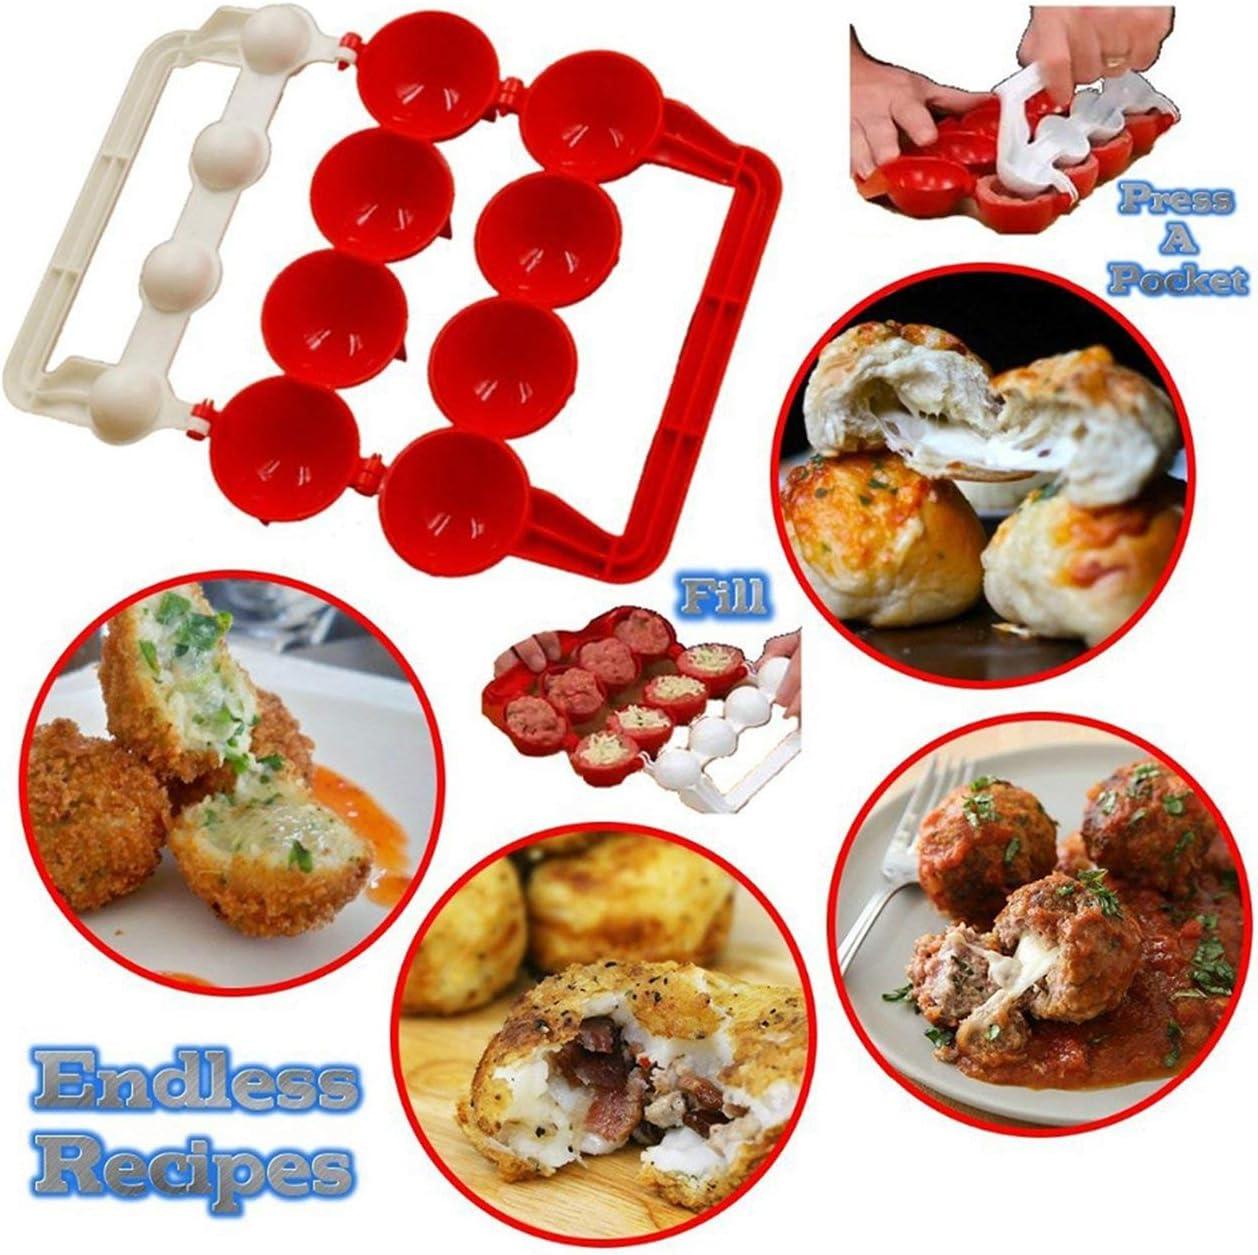 Tv Product Newbie Meatballs Fish Ball Maker Kitchen Tools Homemade Stuffed Meatball Fish Ball Hamburger Maker Mold red Jasnyfall